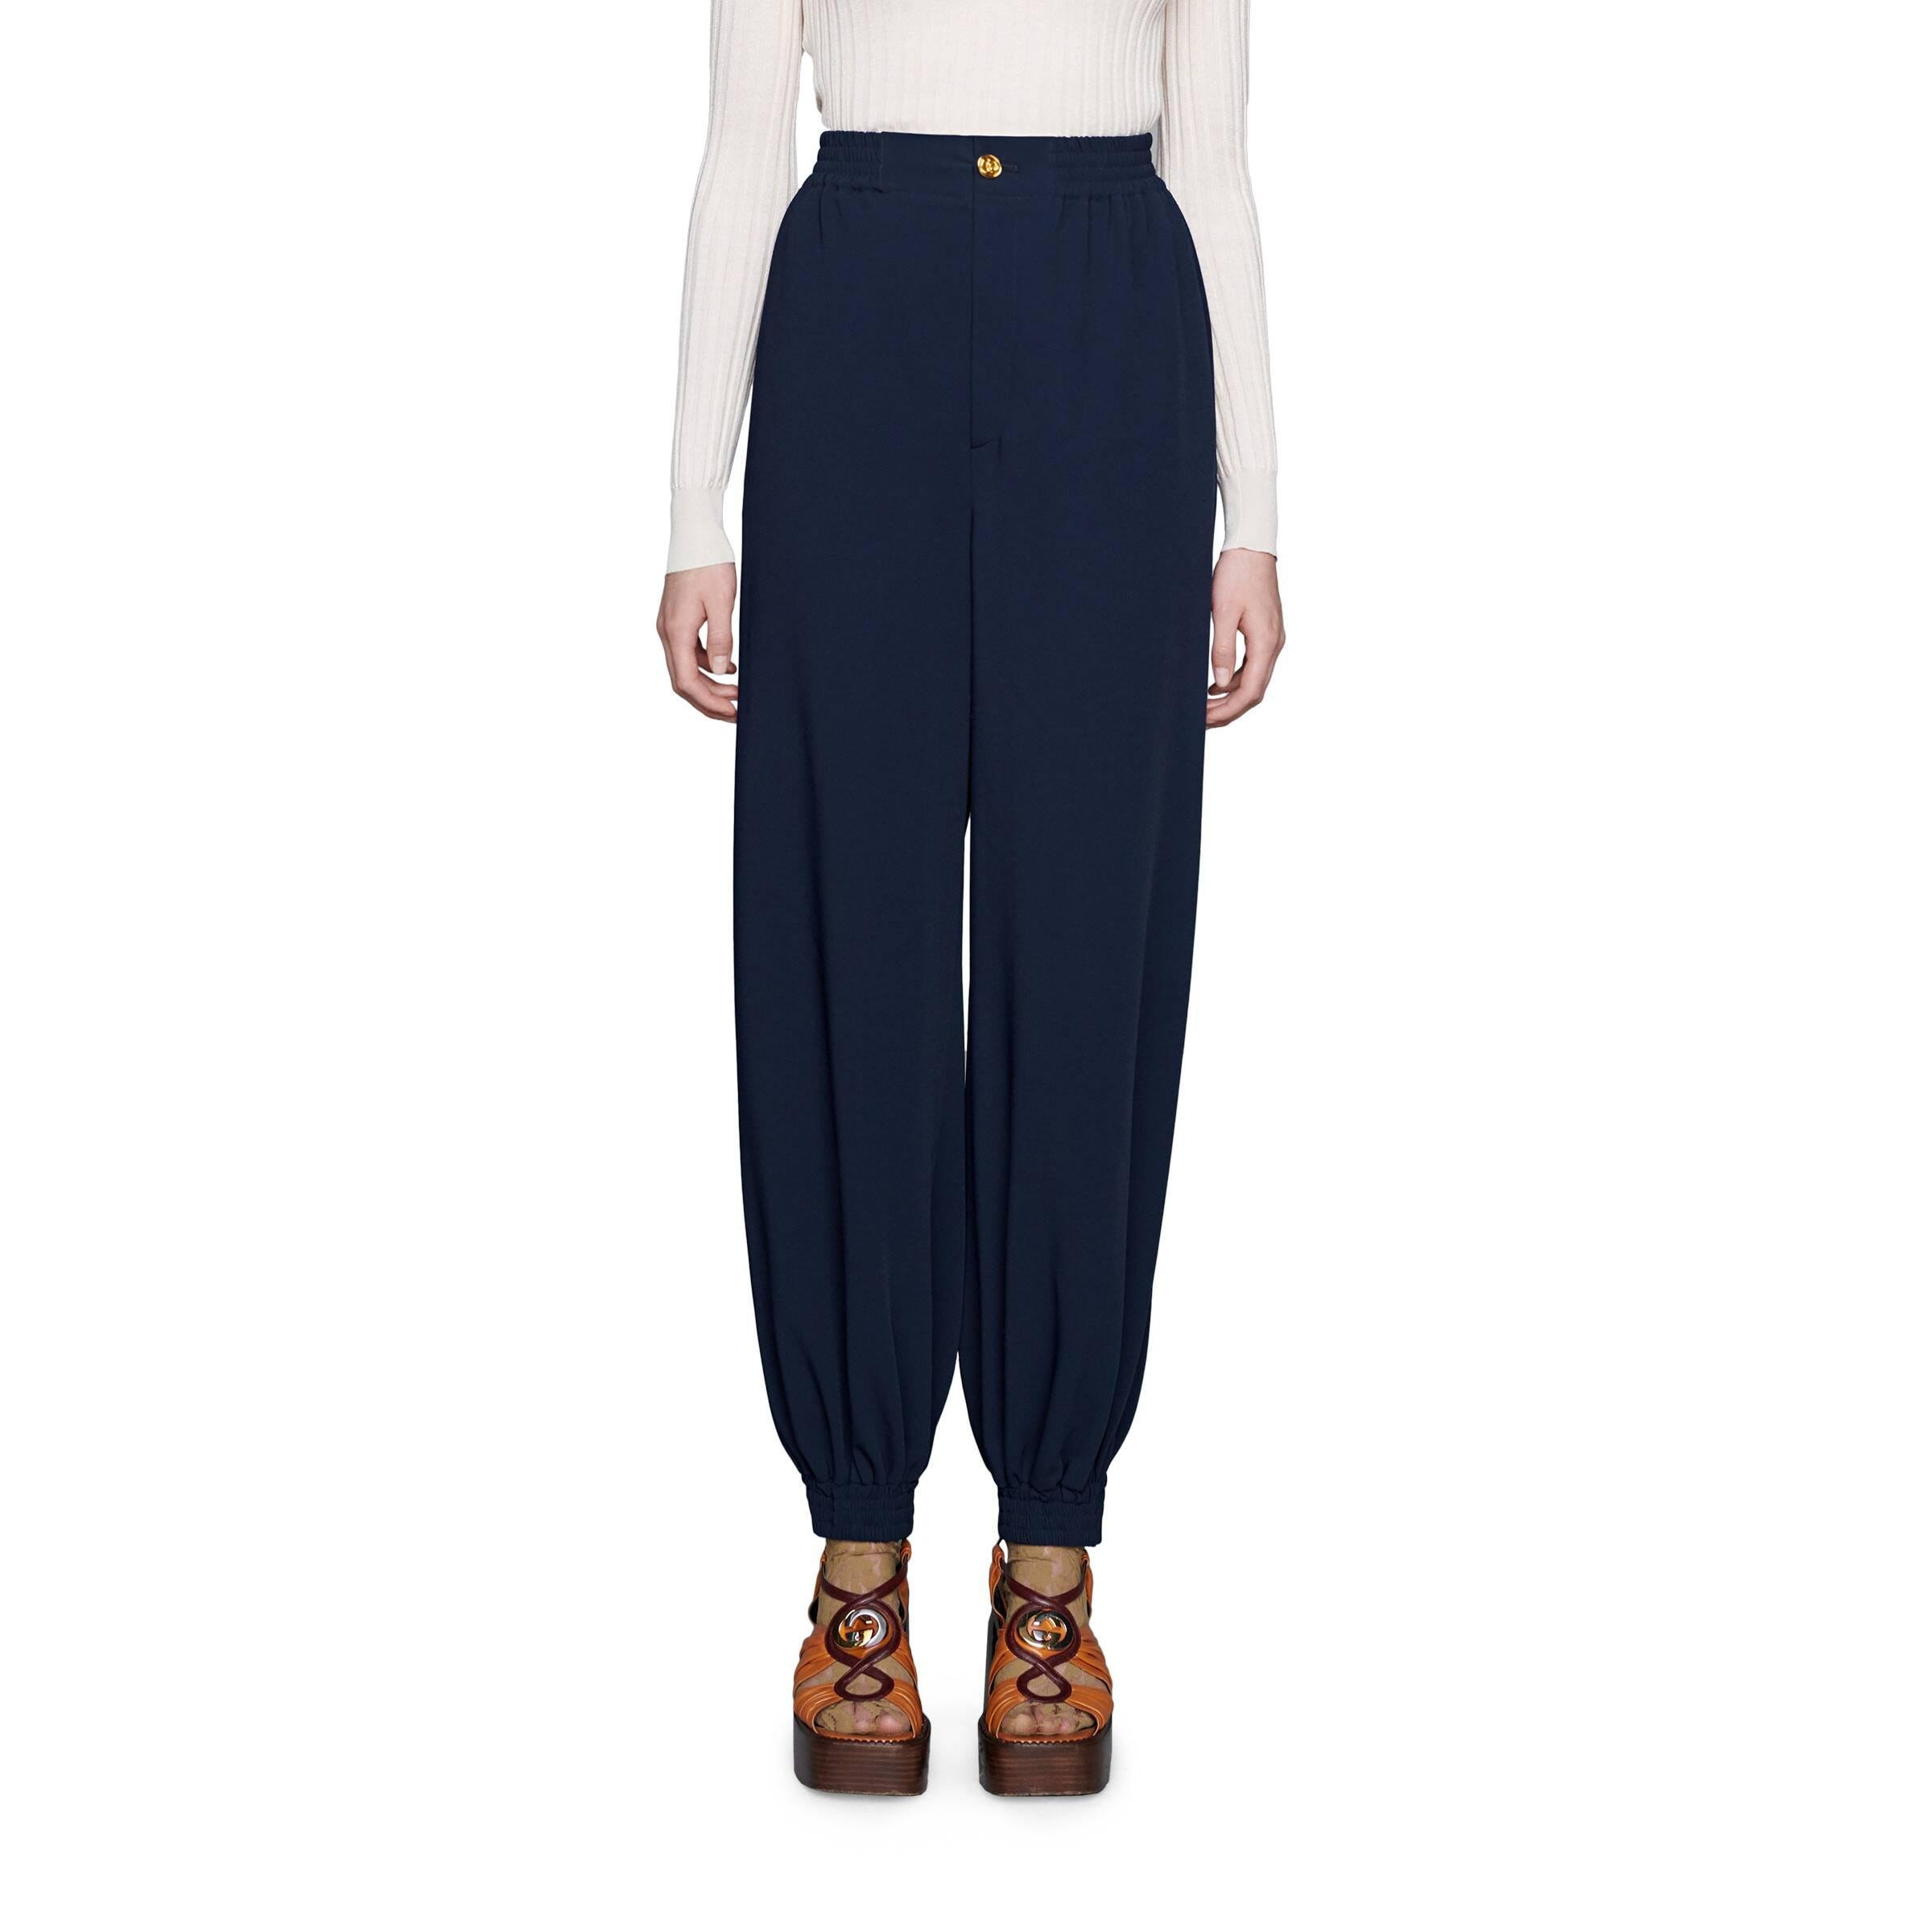 Gucci Blue Cady Harem Pants